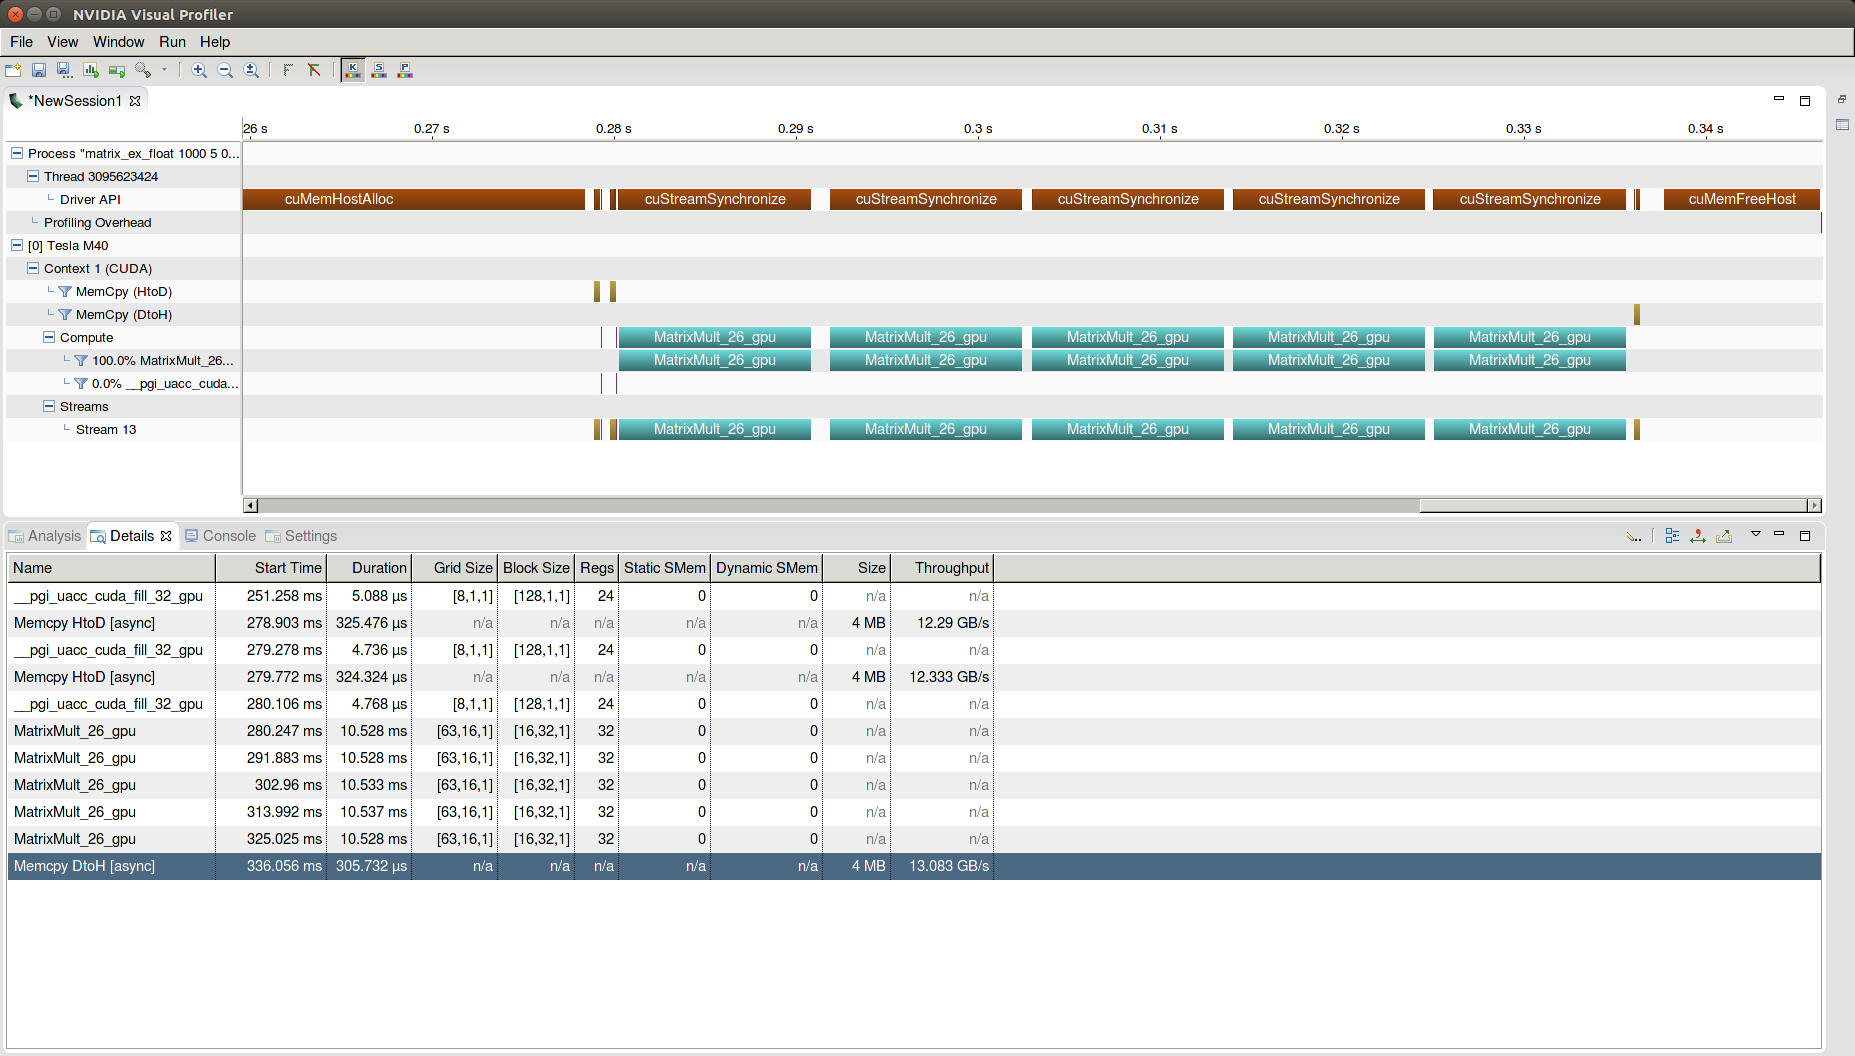 NVIDIA Visual Profiler Timeline when using pcopyin, pcopyout